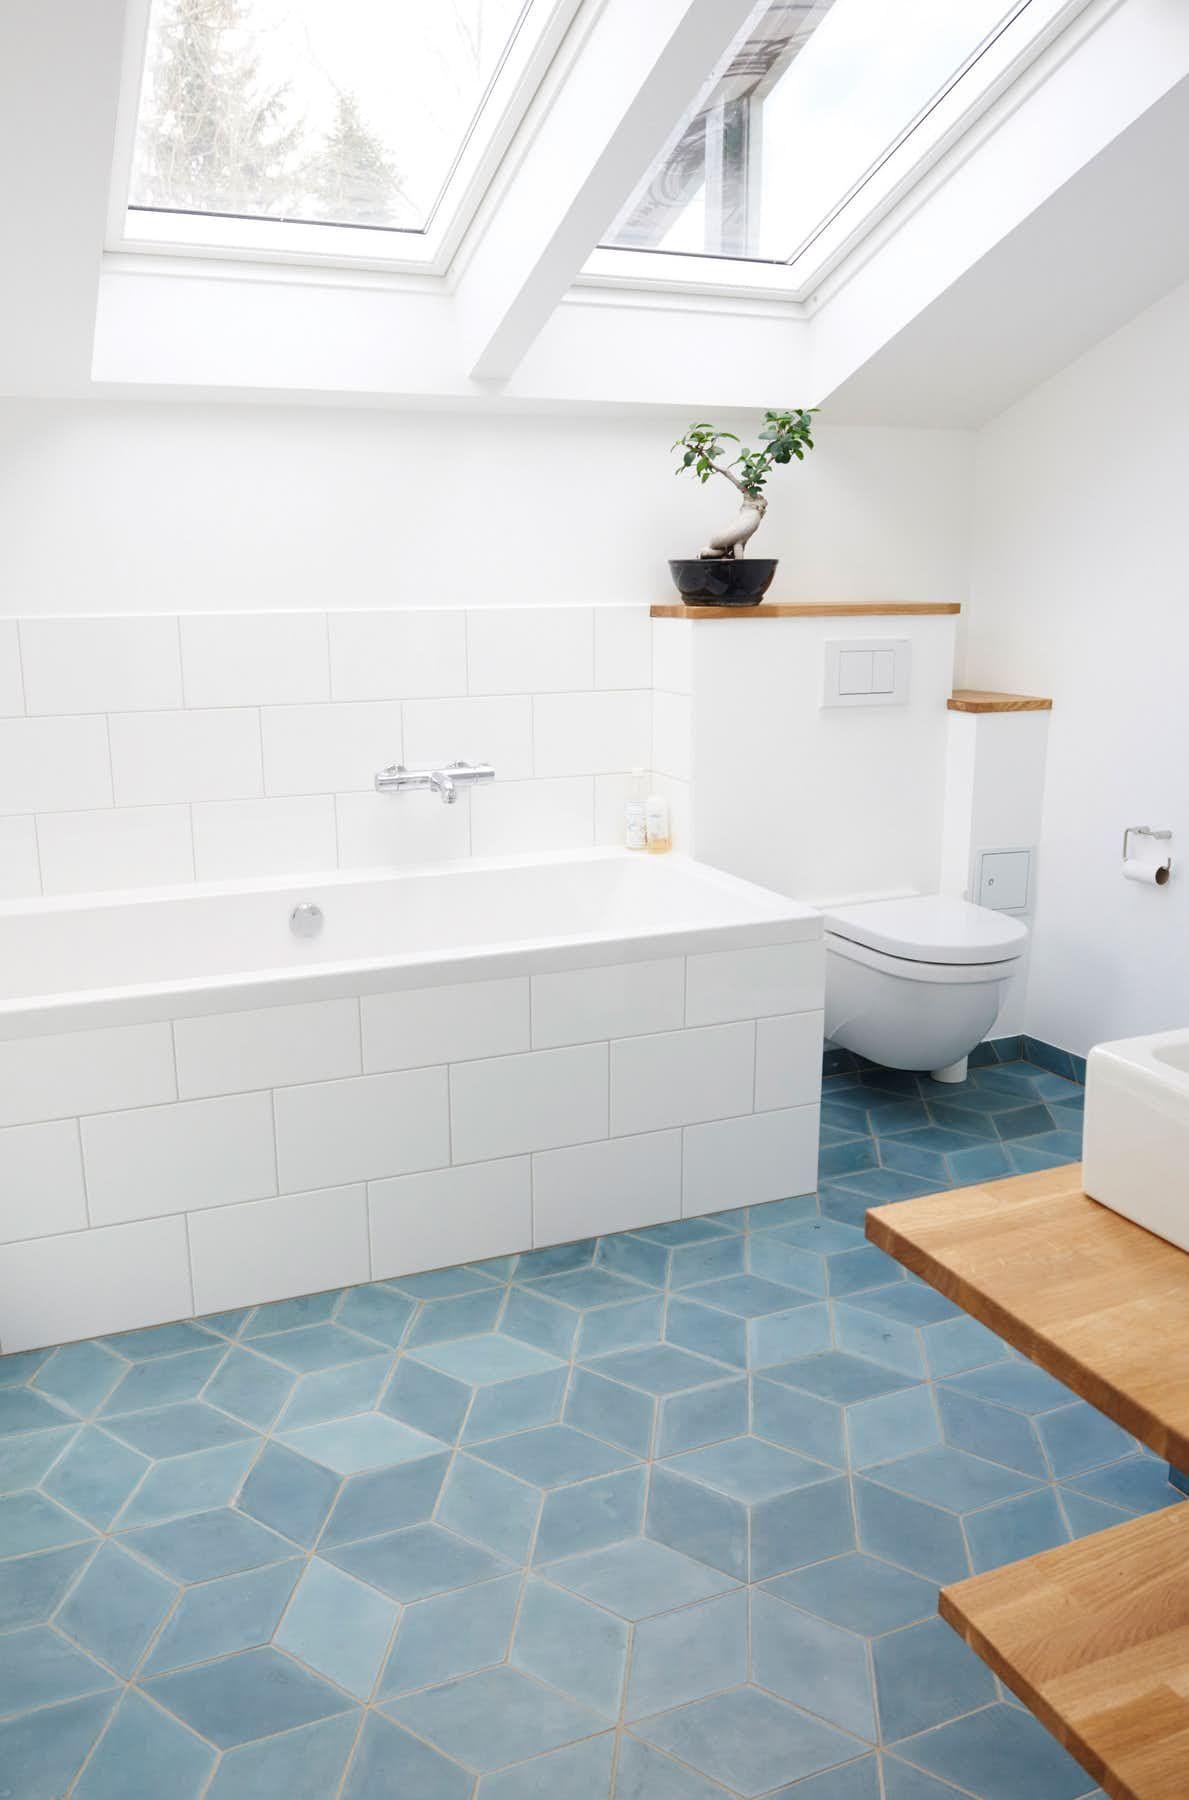 Marokkansk inspiration | Home | Pinterest | Bathroom organization ...